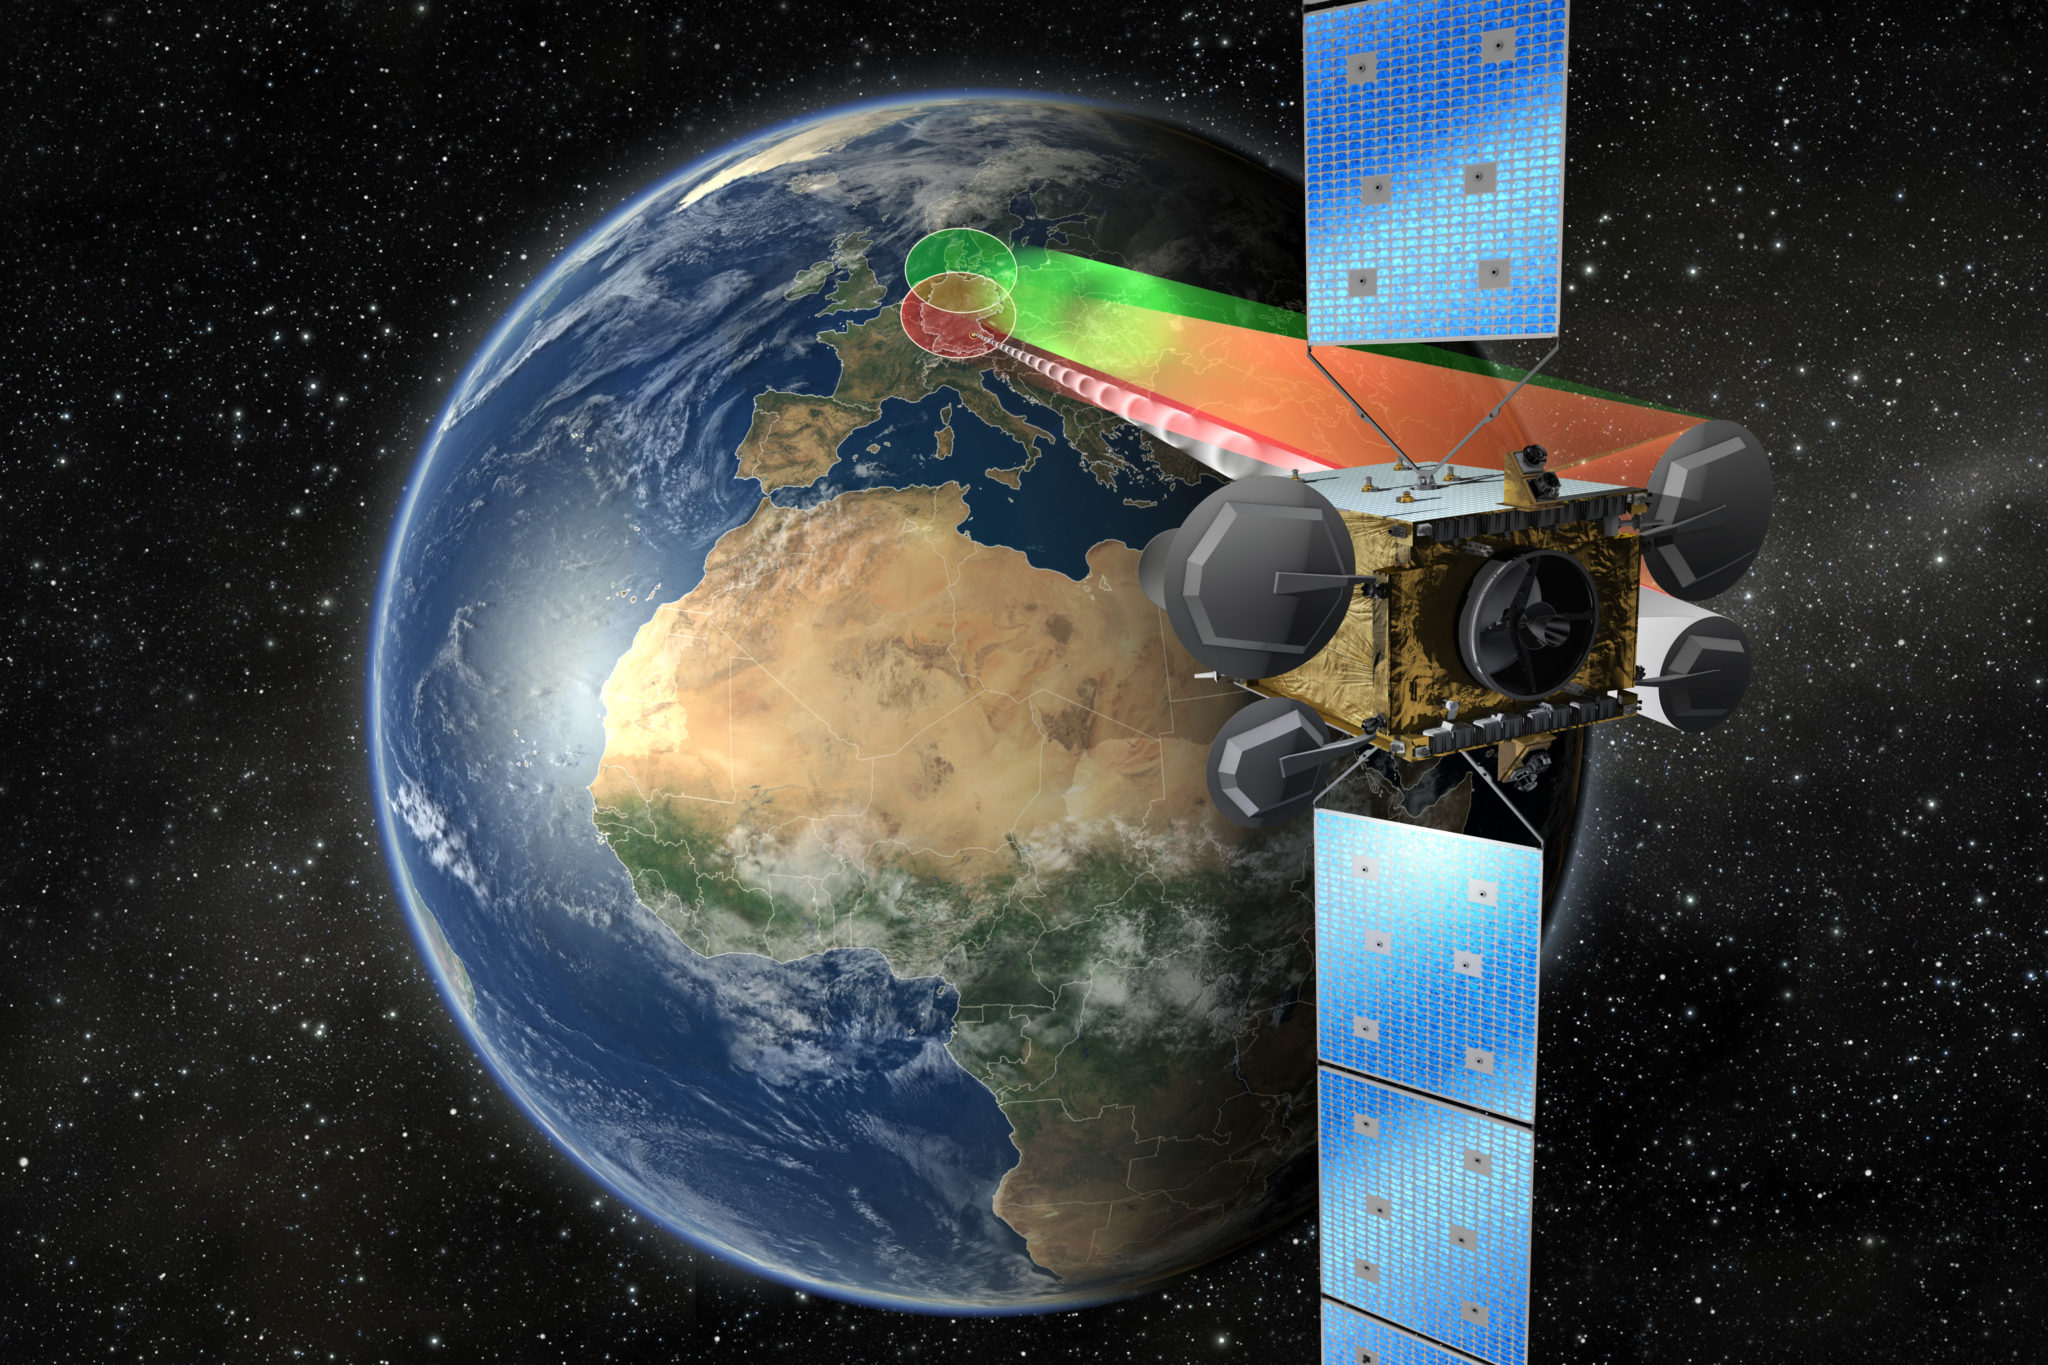 Heinrich Hertz Satellite OHB